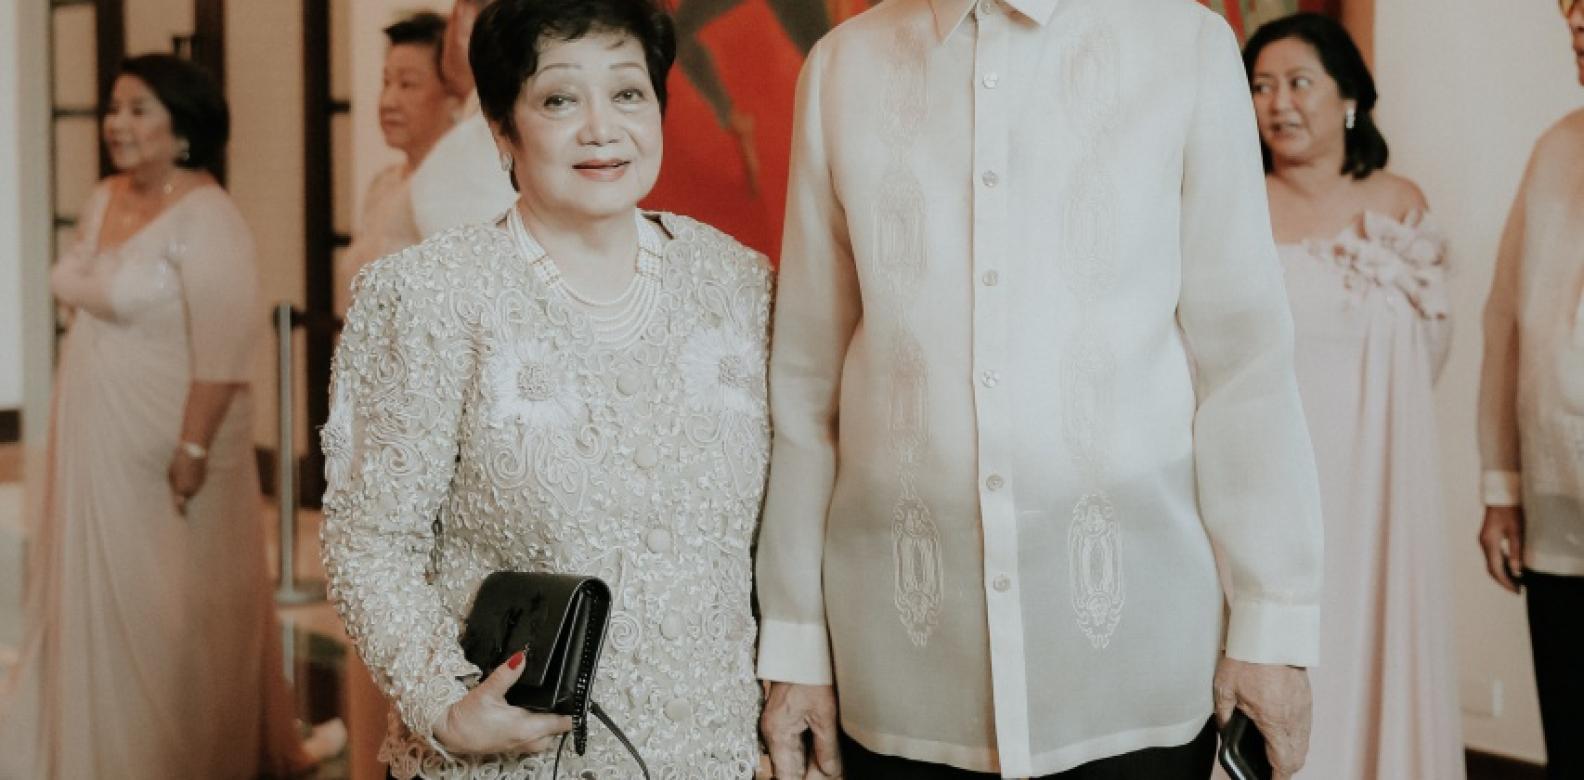 Mrs. and Ambassador Antonio Villamayor